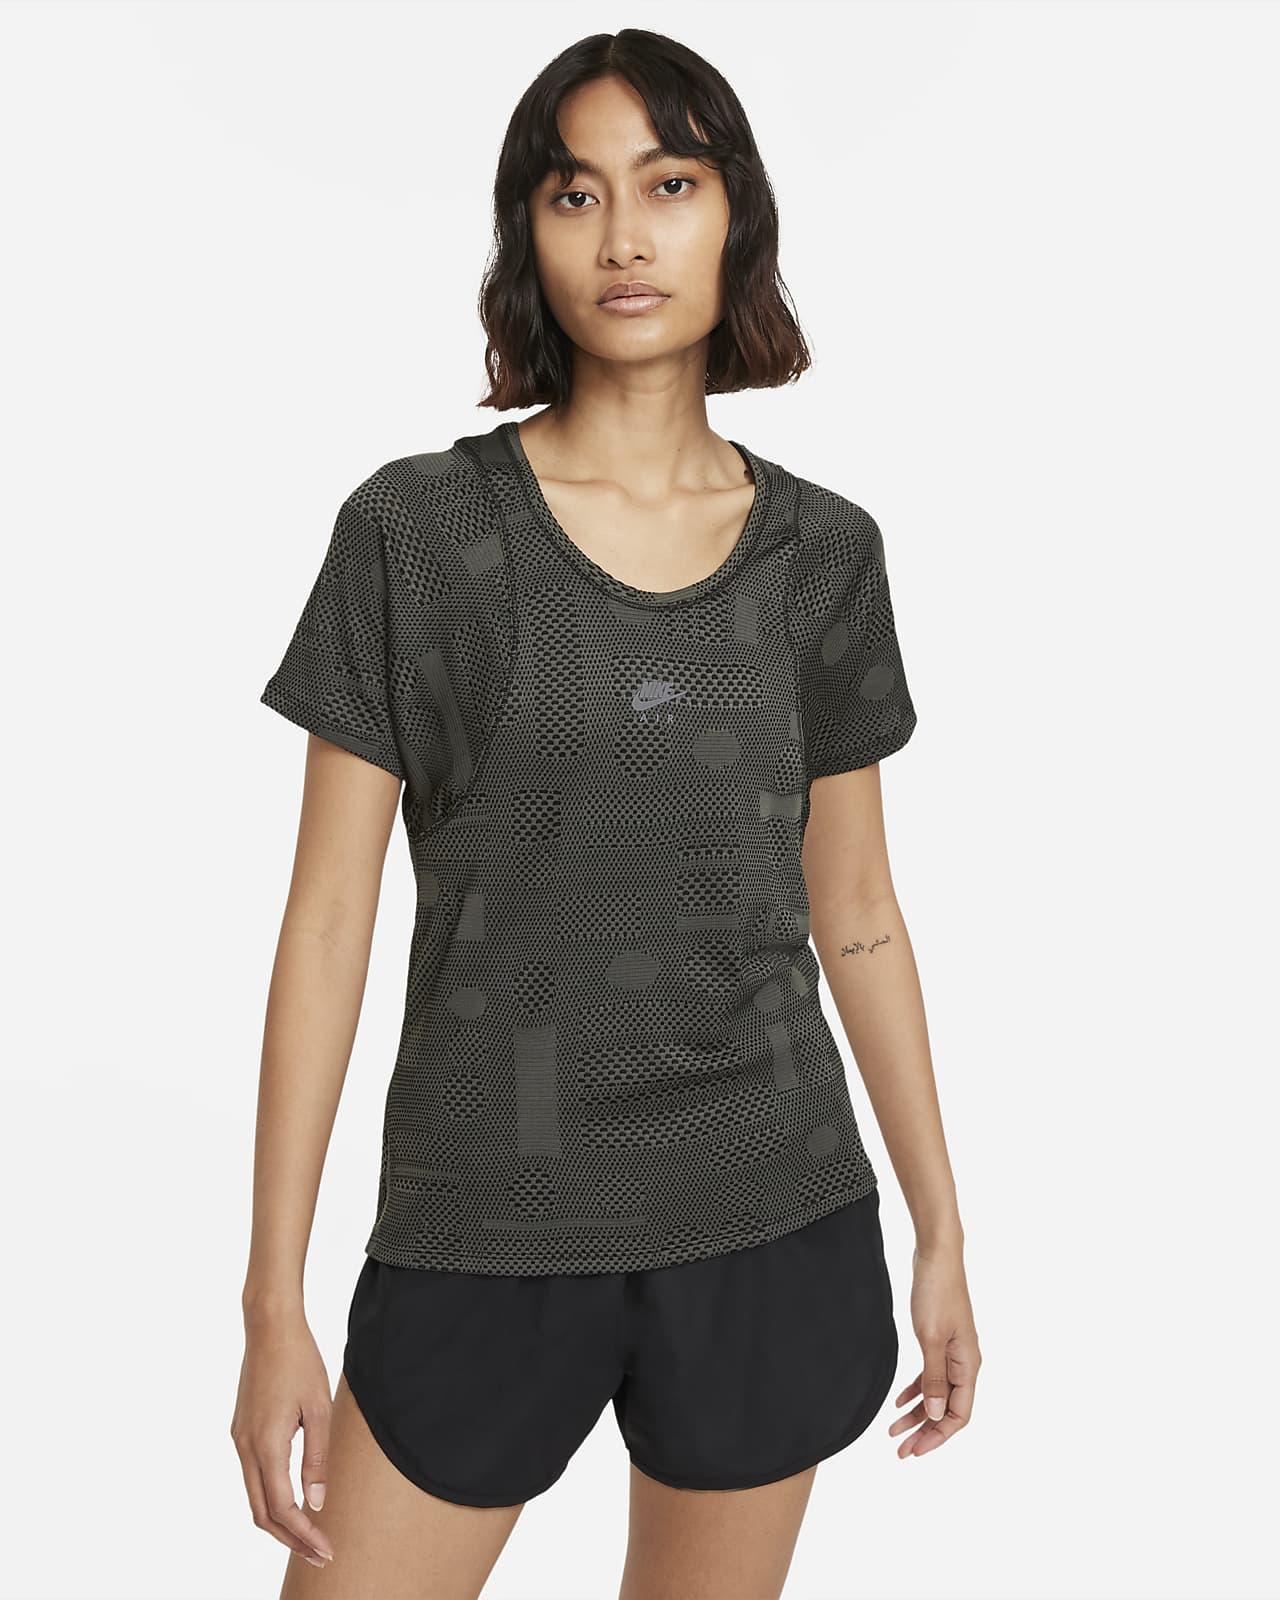 Женская беговая футболка с коротким рукавом Nike Air Dri-FIT